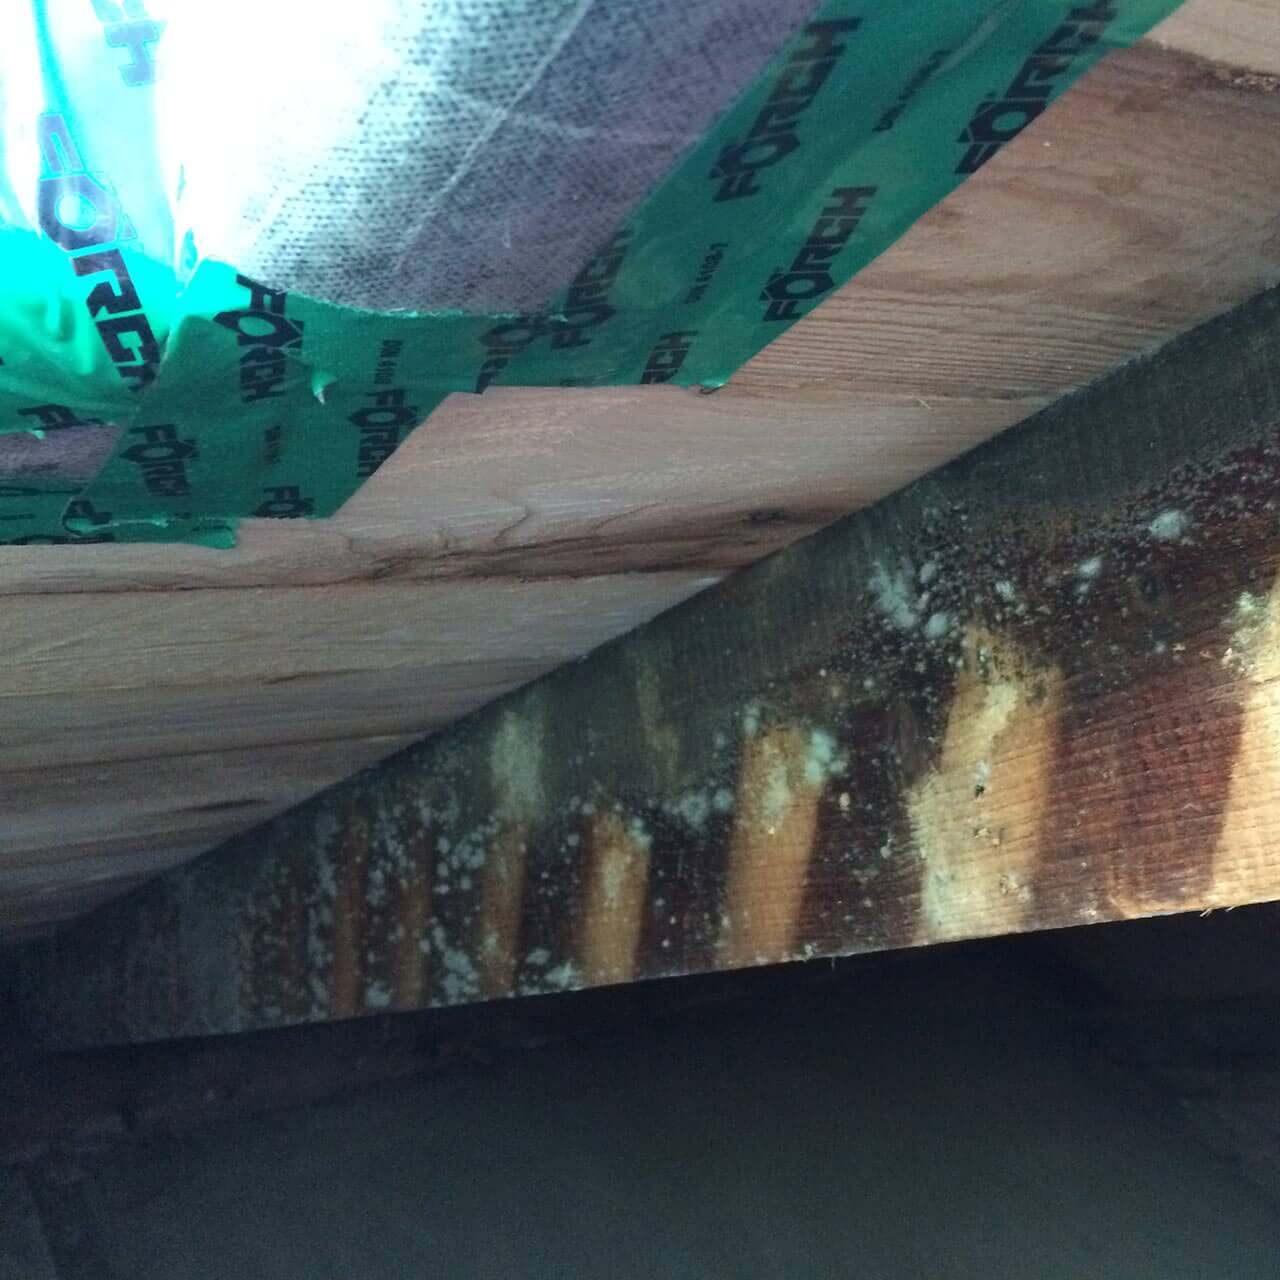 klima center schimmel dachboden - Schimmel Beseitigung